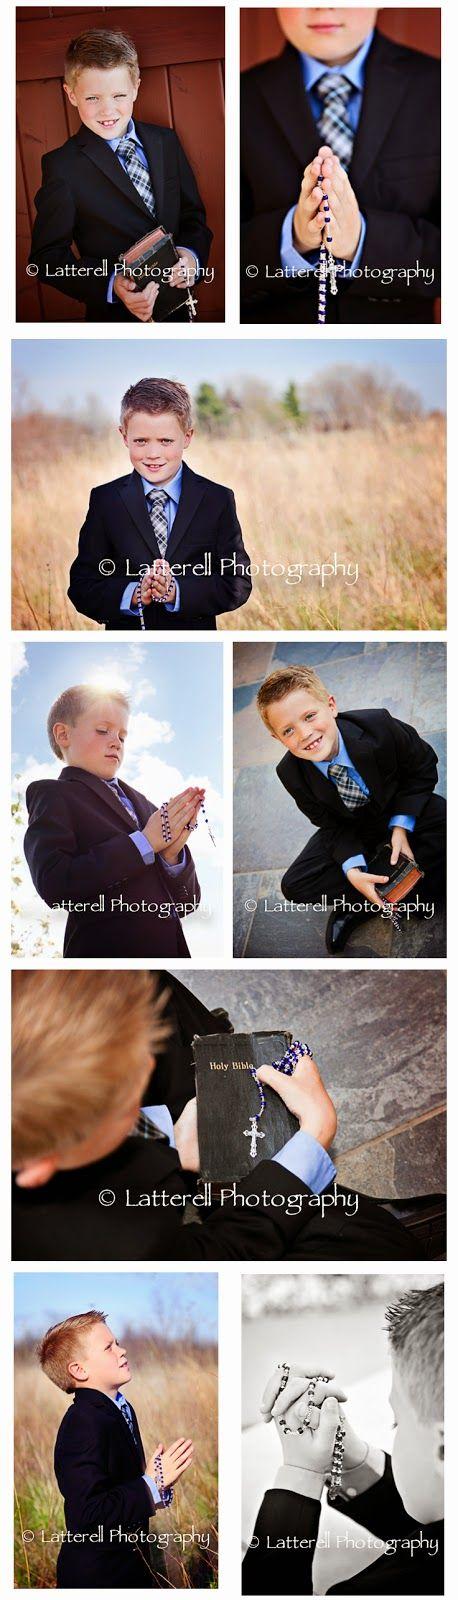 Latterell Photography - FIrst Communion Boy